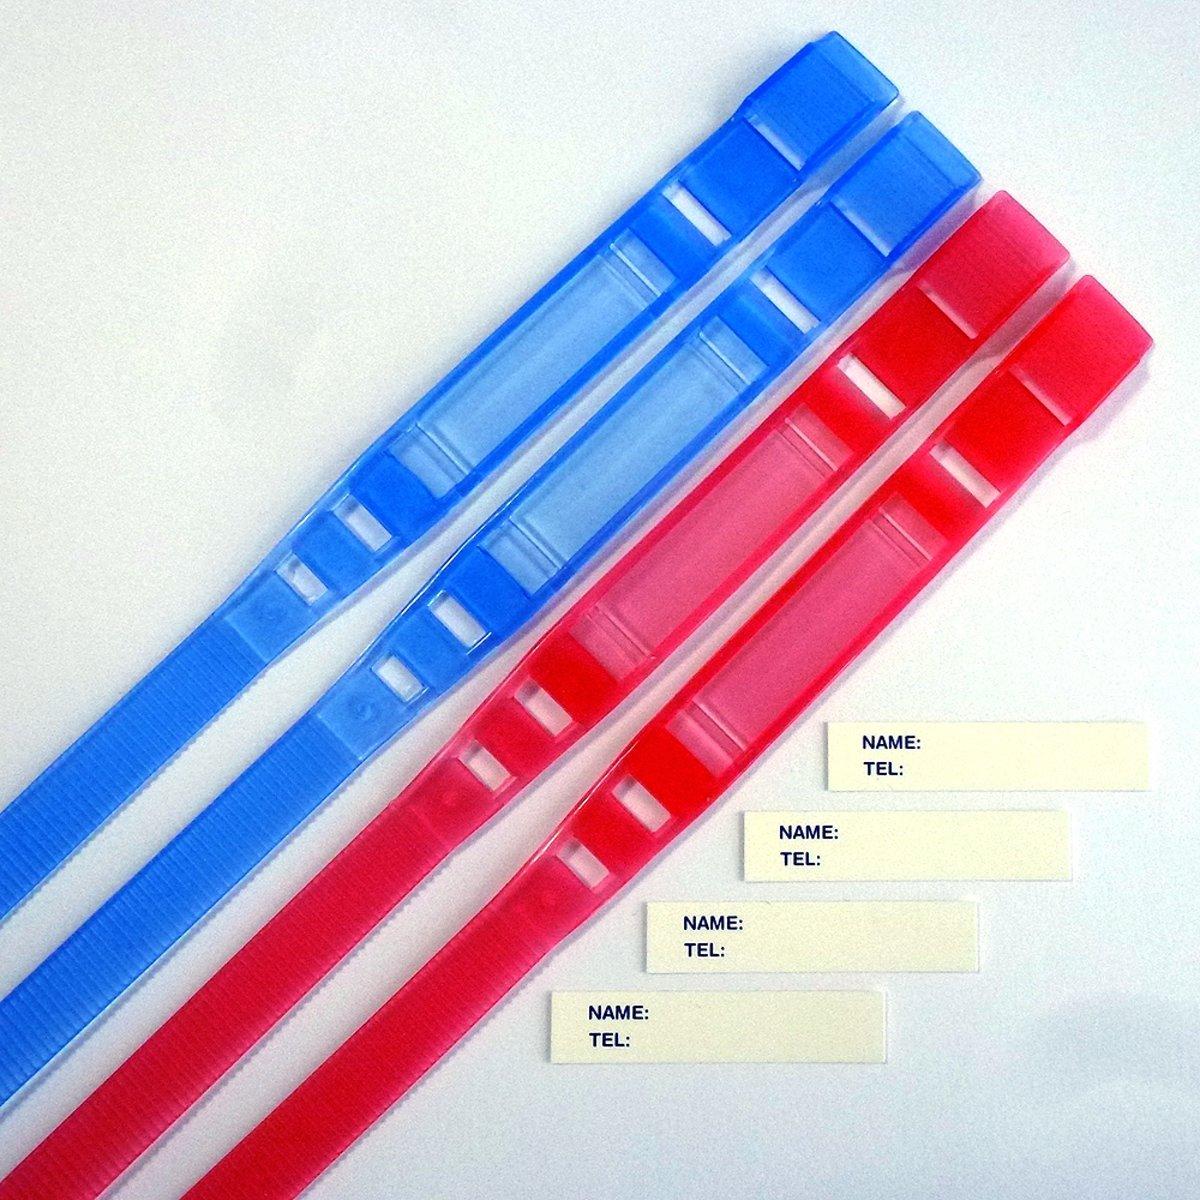 Fabulous bol.com | SOS-armbandje kopen? Alle SOS-armbandjes online #HC34